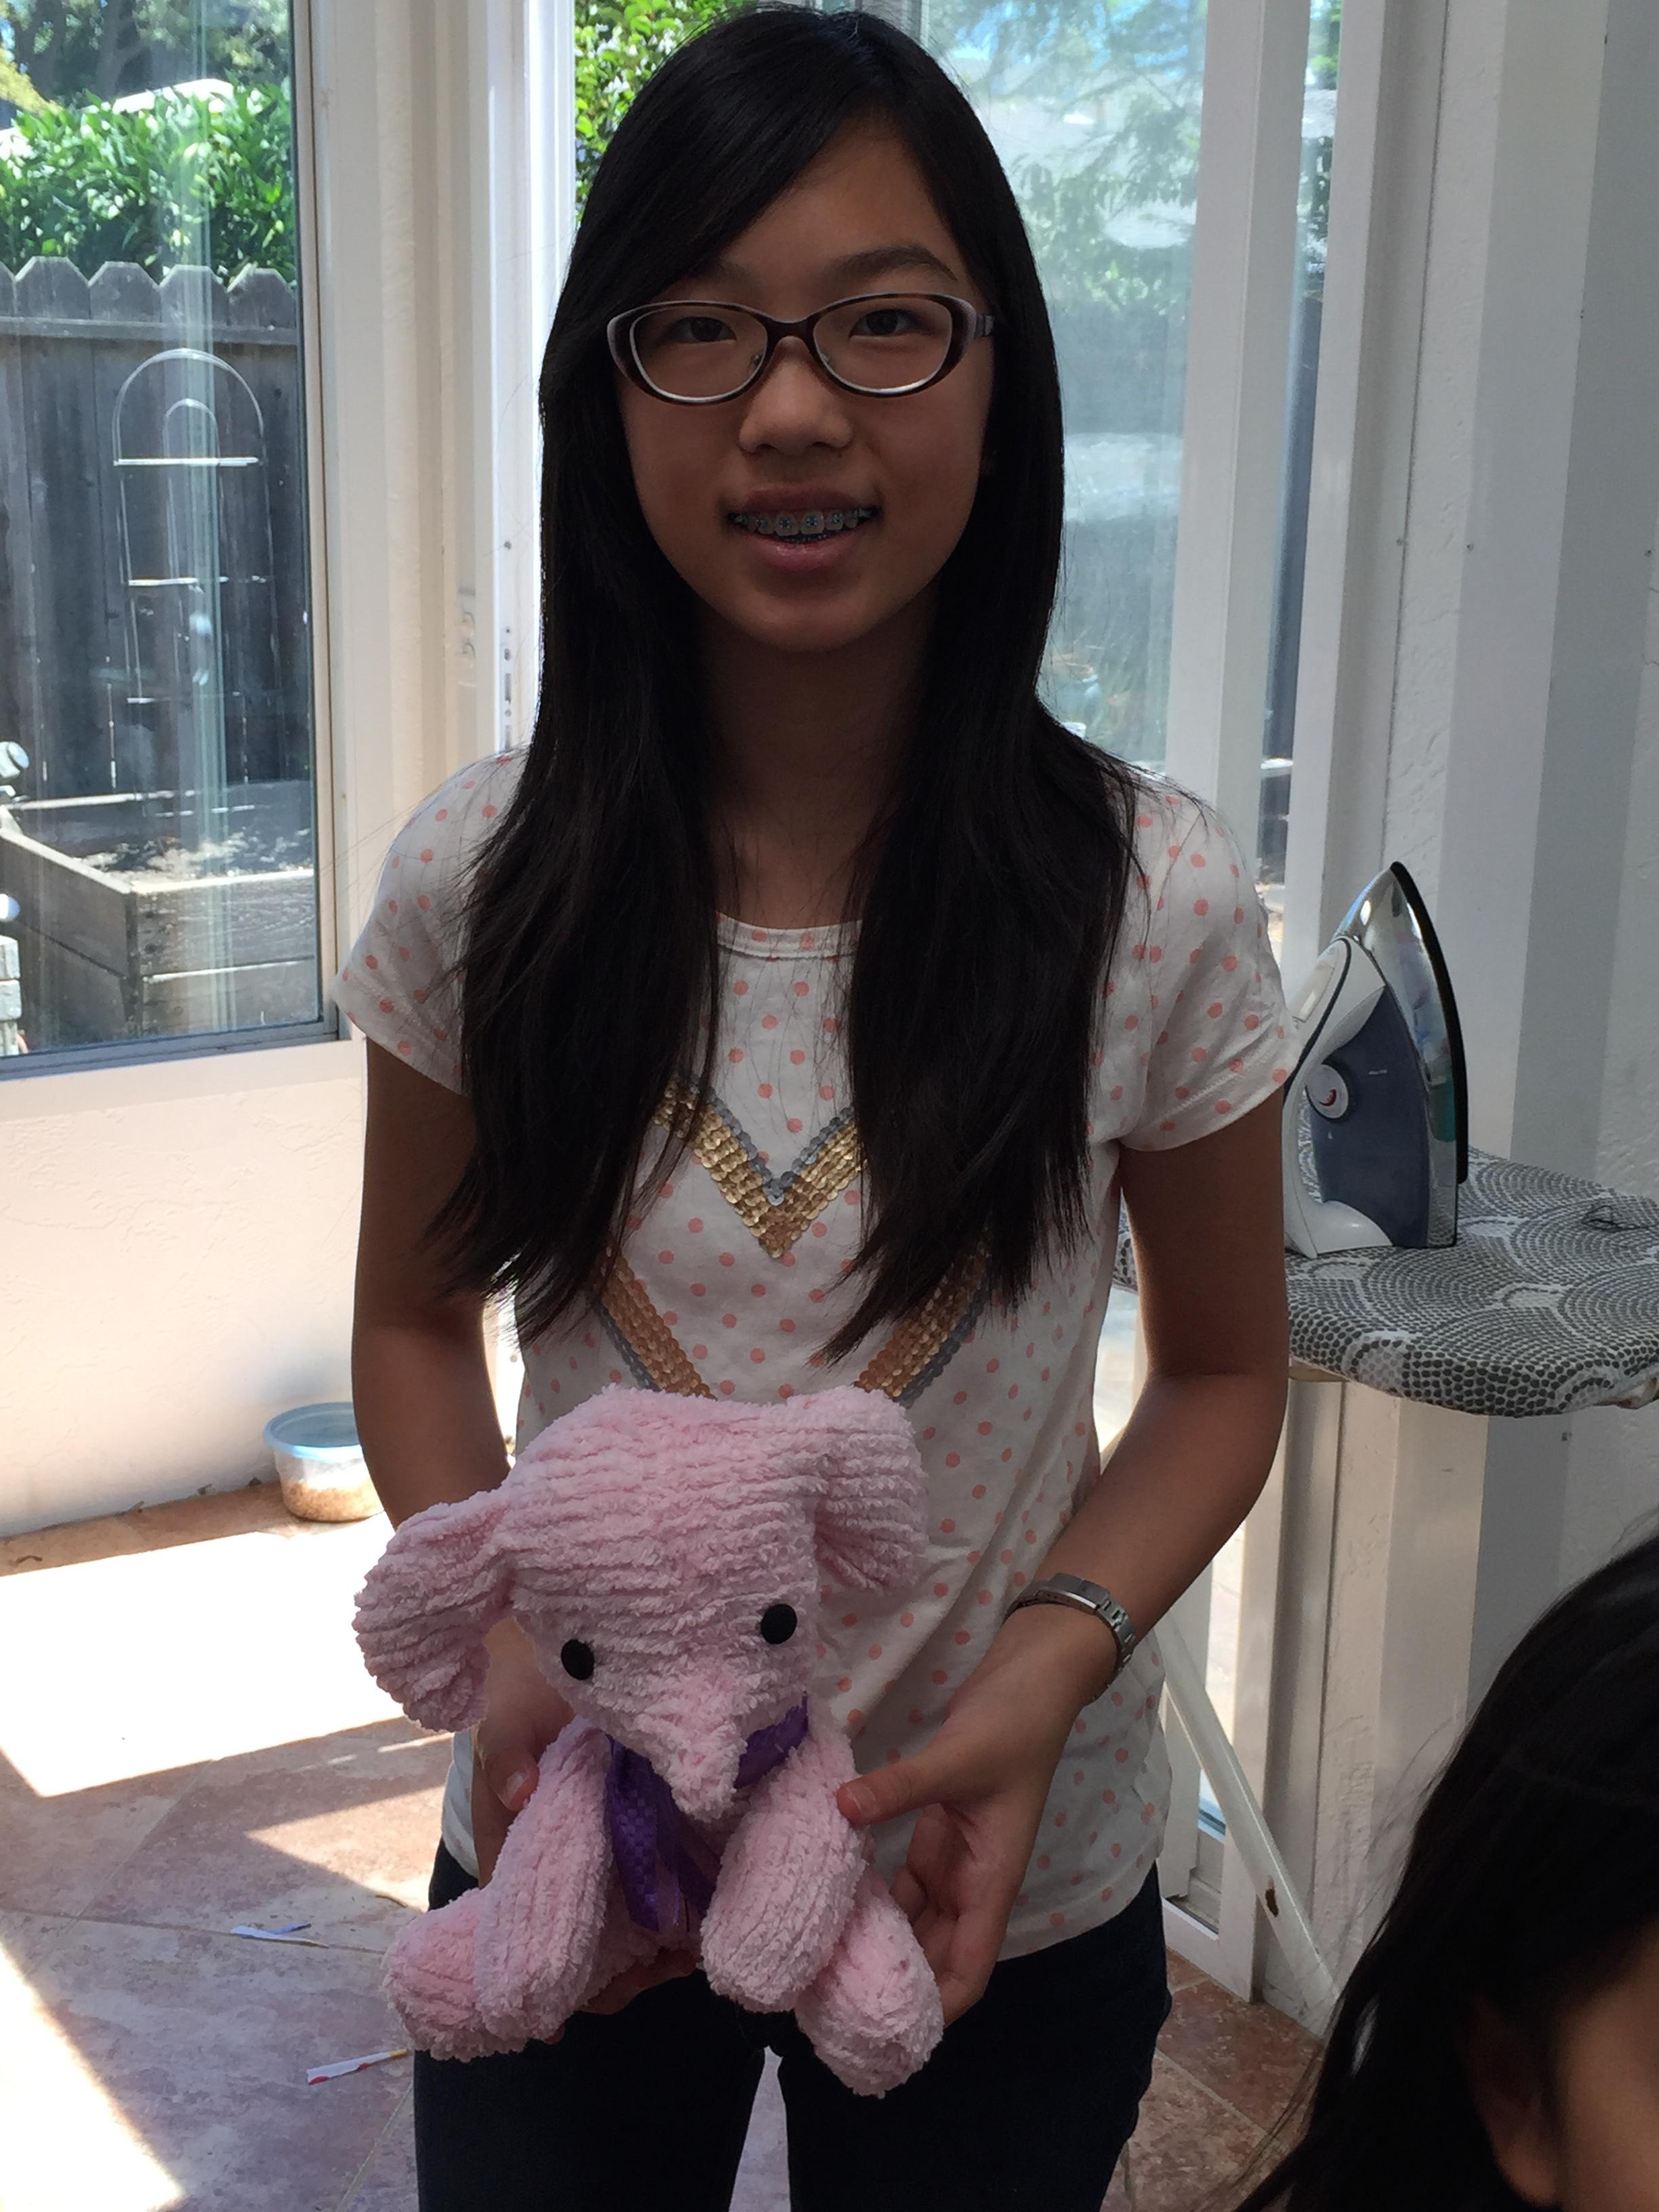 Elephant stuffie.